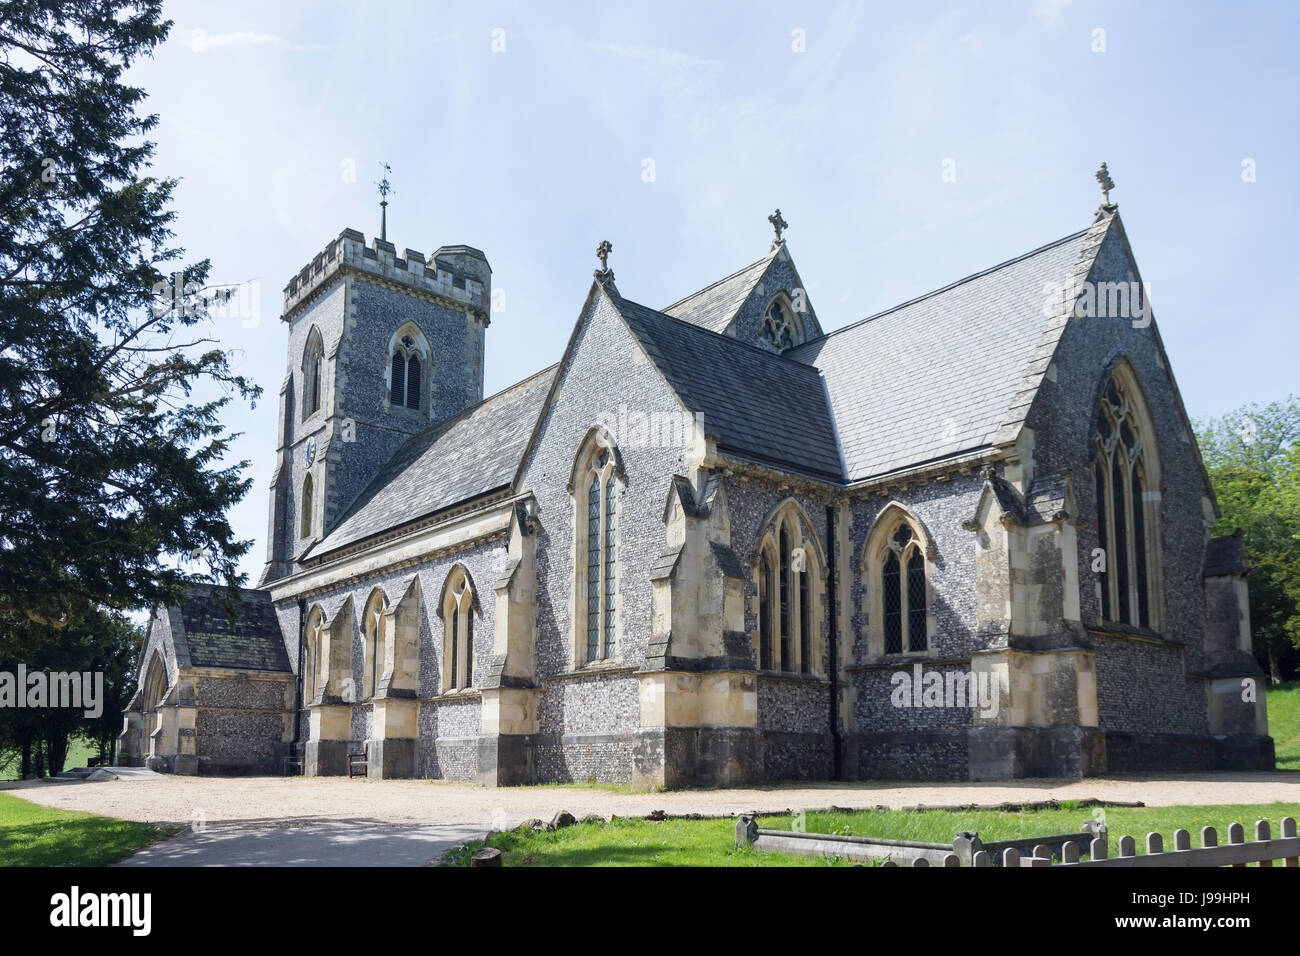 The Parish Church of Saint John the Evangelist, Church Lane, West Meon, Hampshire, England, United Kingdom - Stock Image